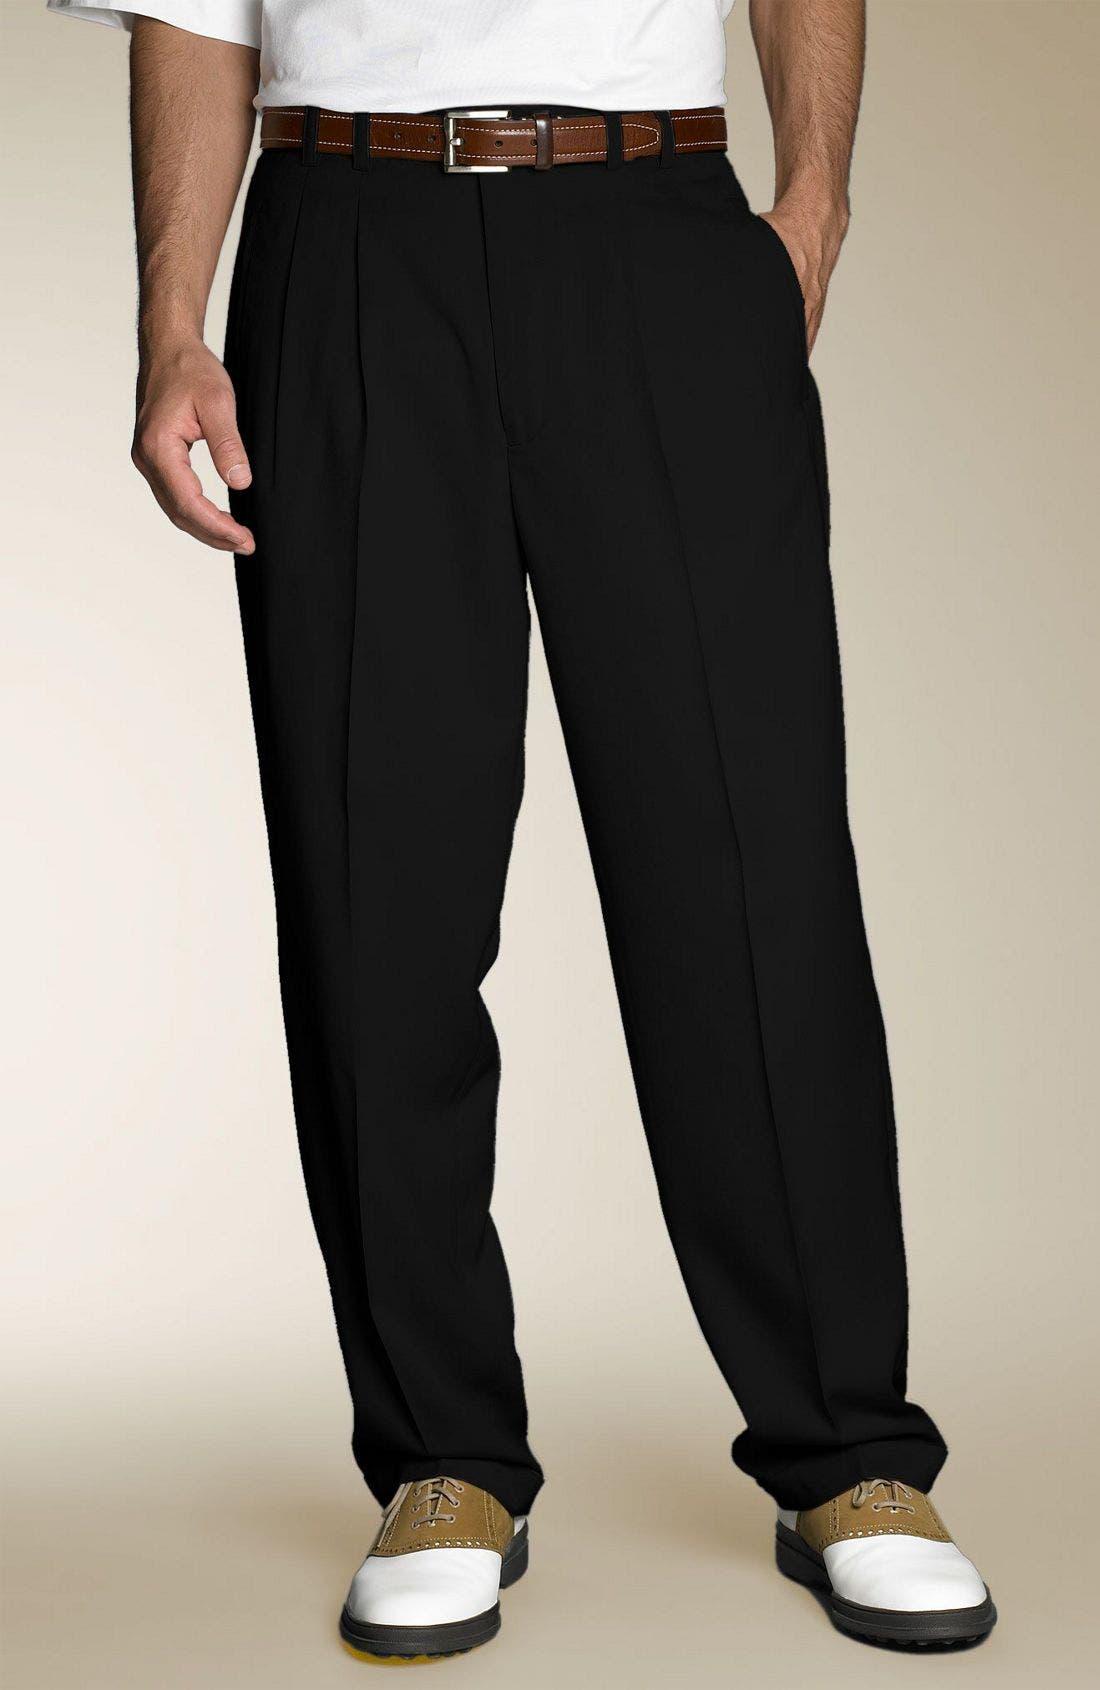 Alternate Image 1 Selected - Cutter & Buck Gabardine Microfiber Cuff Golf Trousers